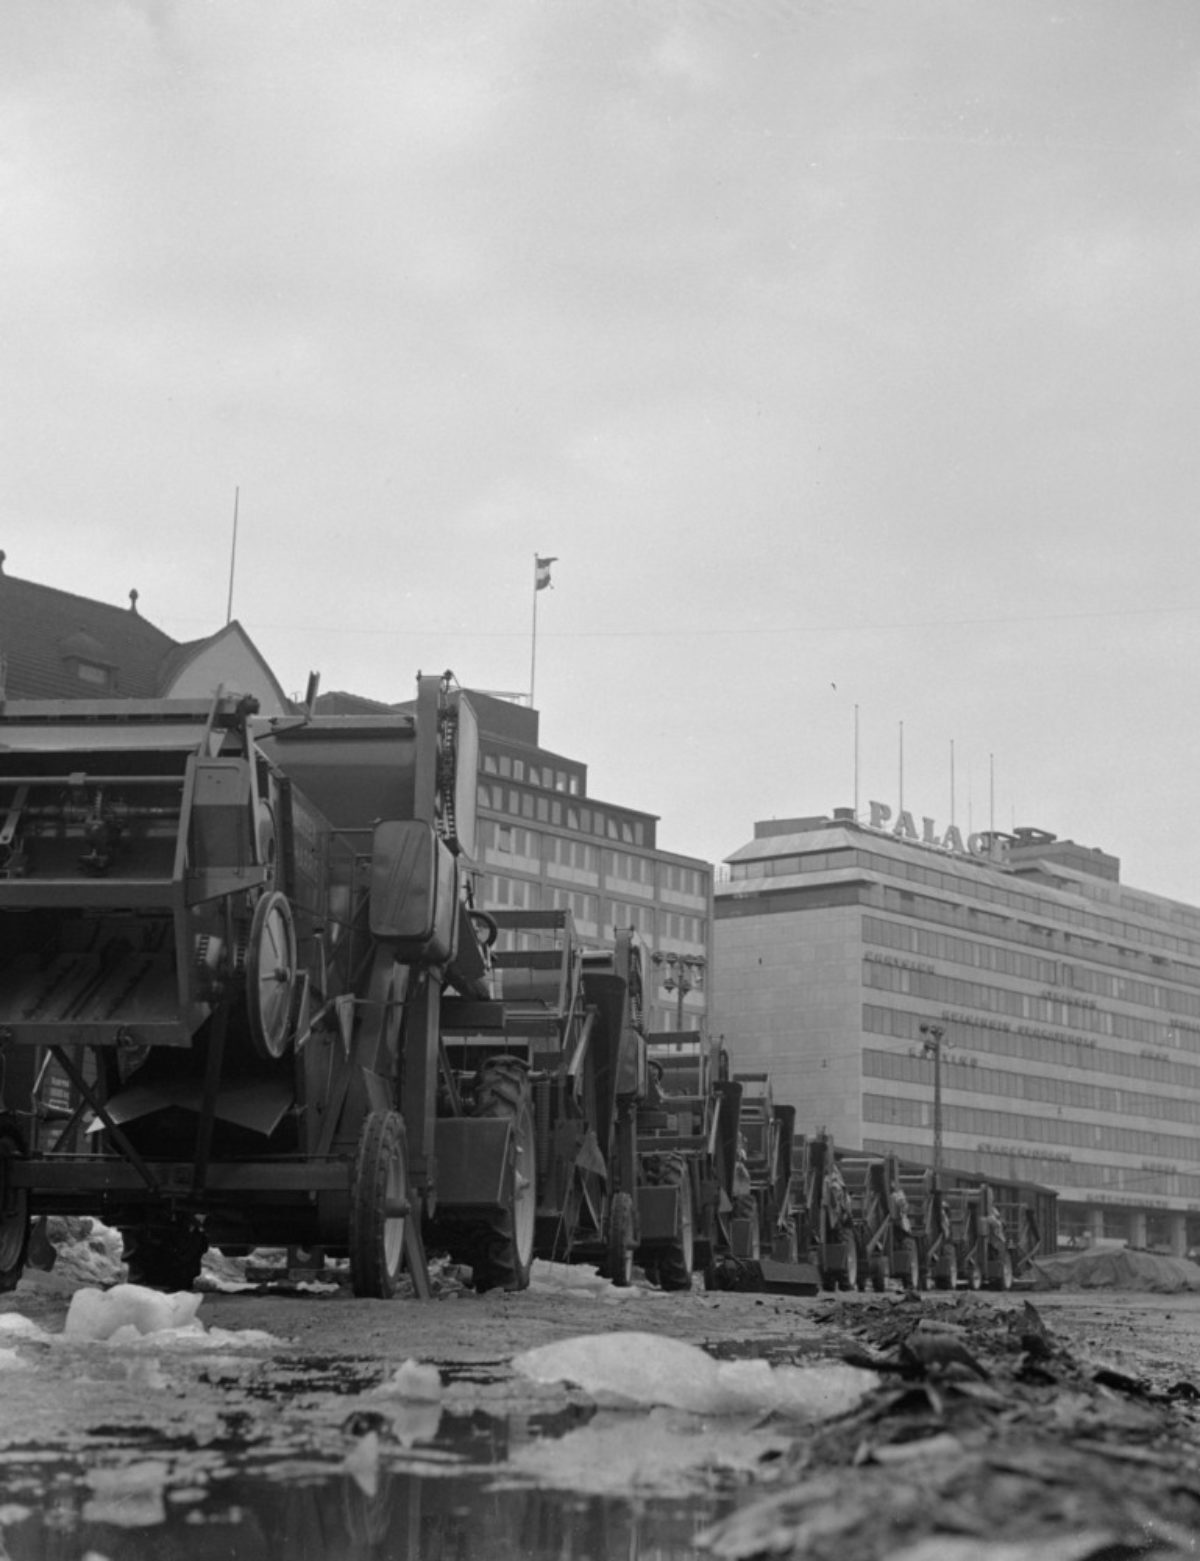 Skördetröskor på Södra Kajen i Helsingfors, 1956. Foto: Erkki Voutilainen / Maaseudun Tulevaisuus / JOKA / Museiverket